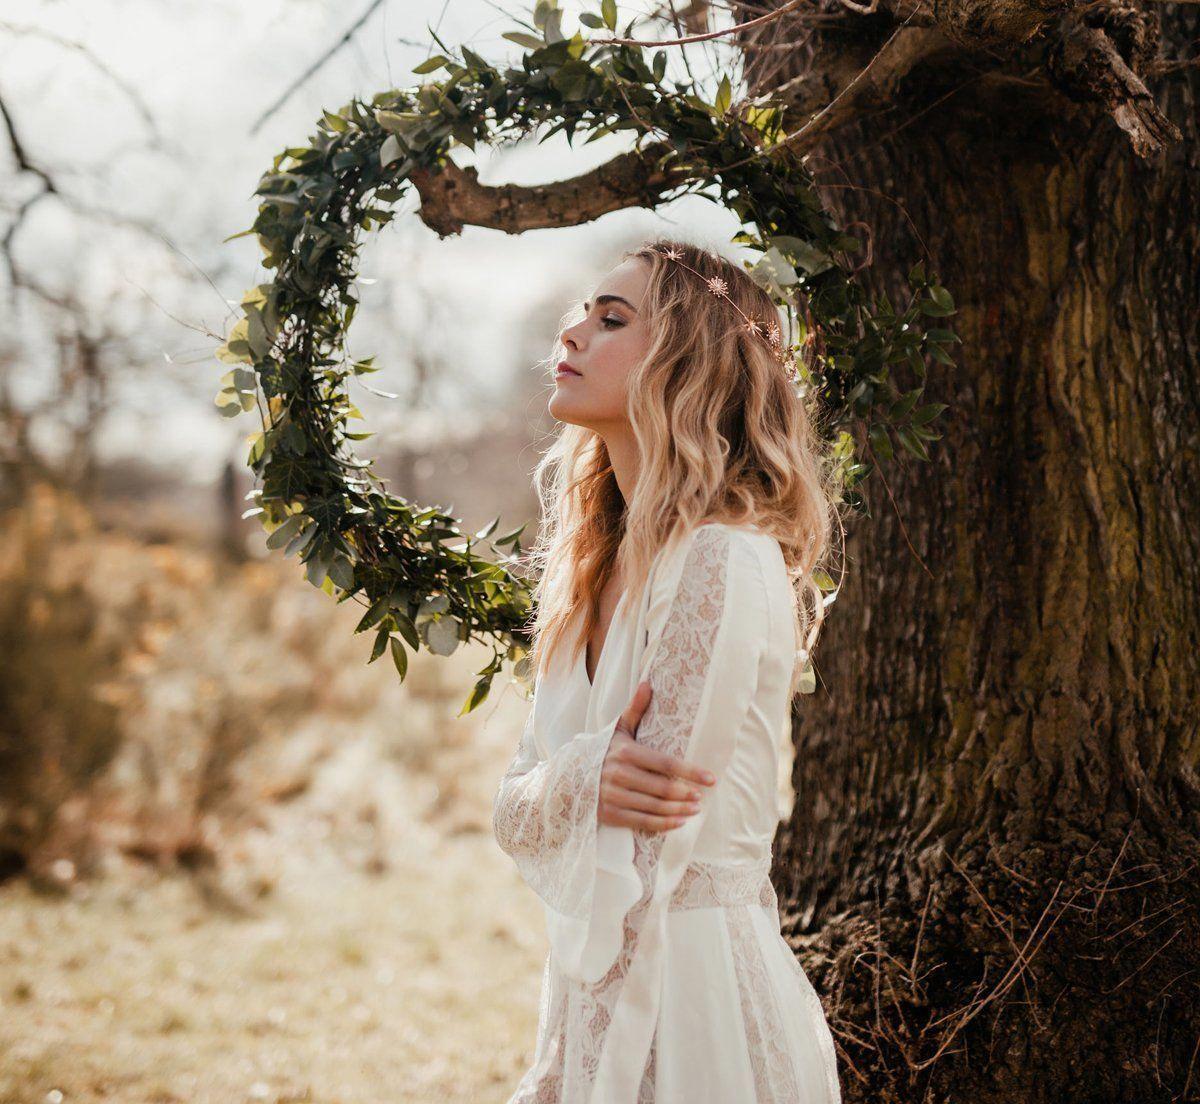 Very Good Wedding Theme Ideas #weddingthemeideas